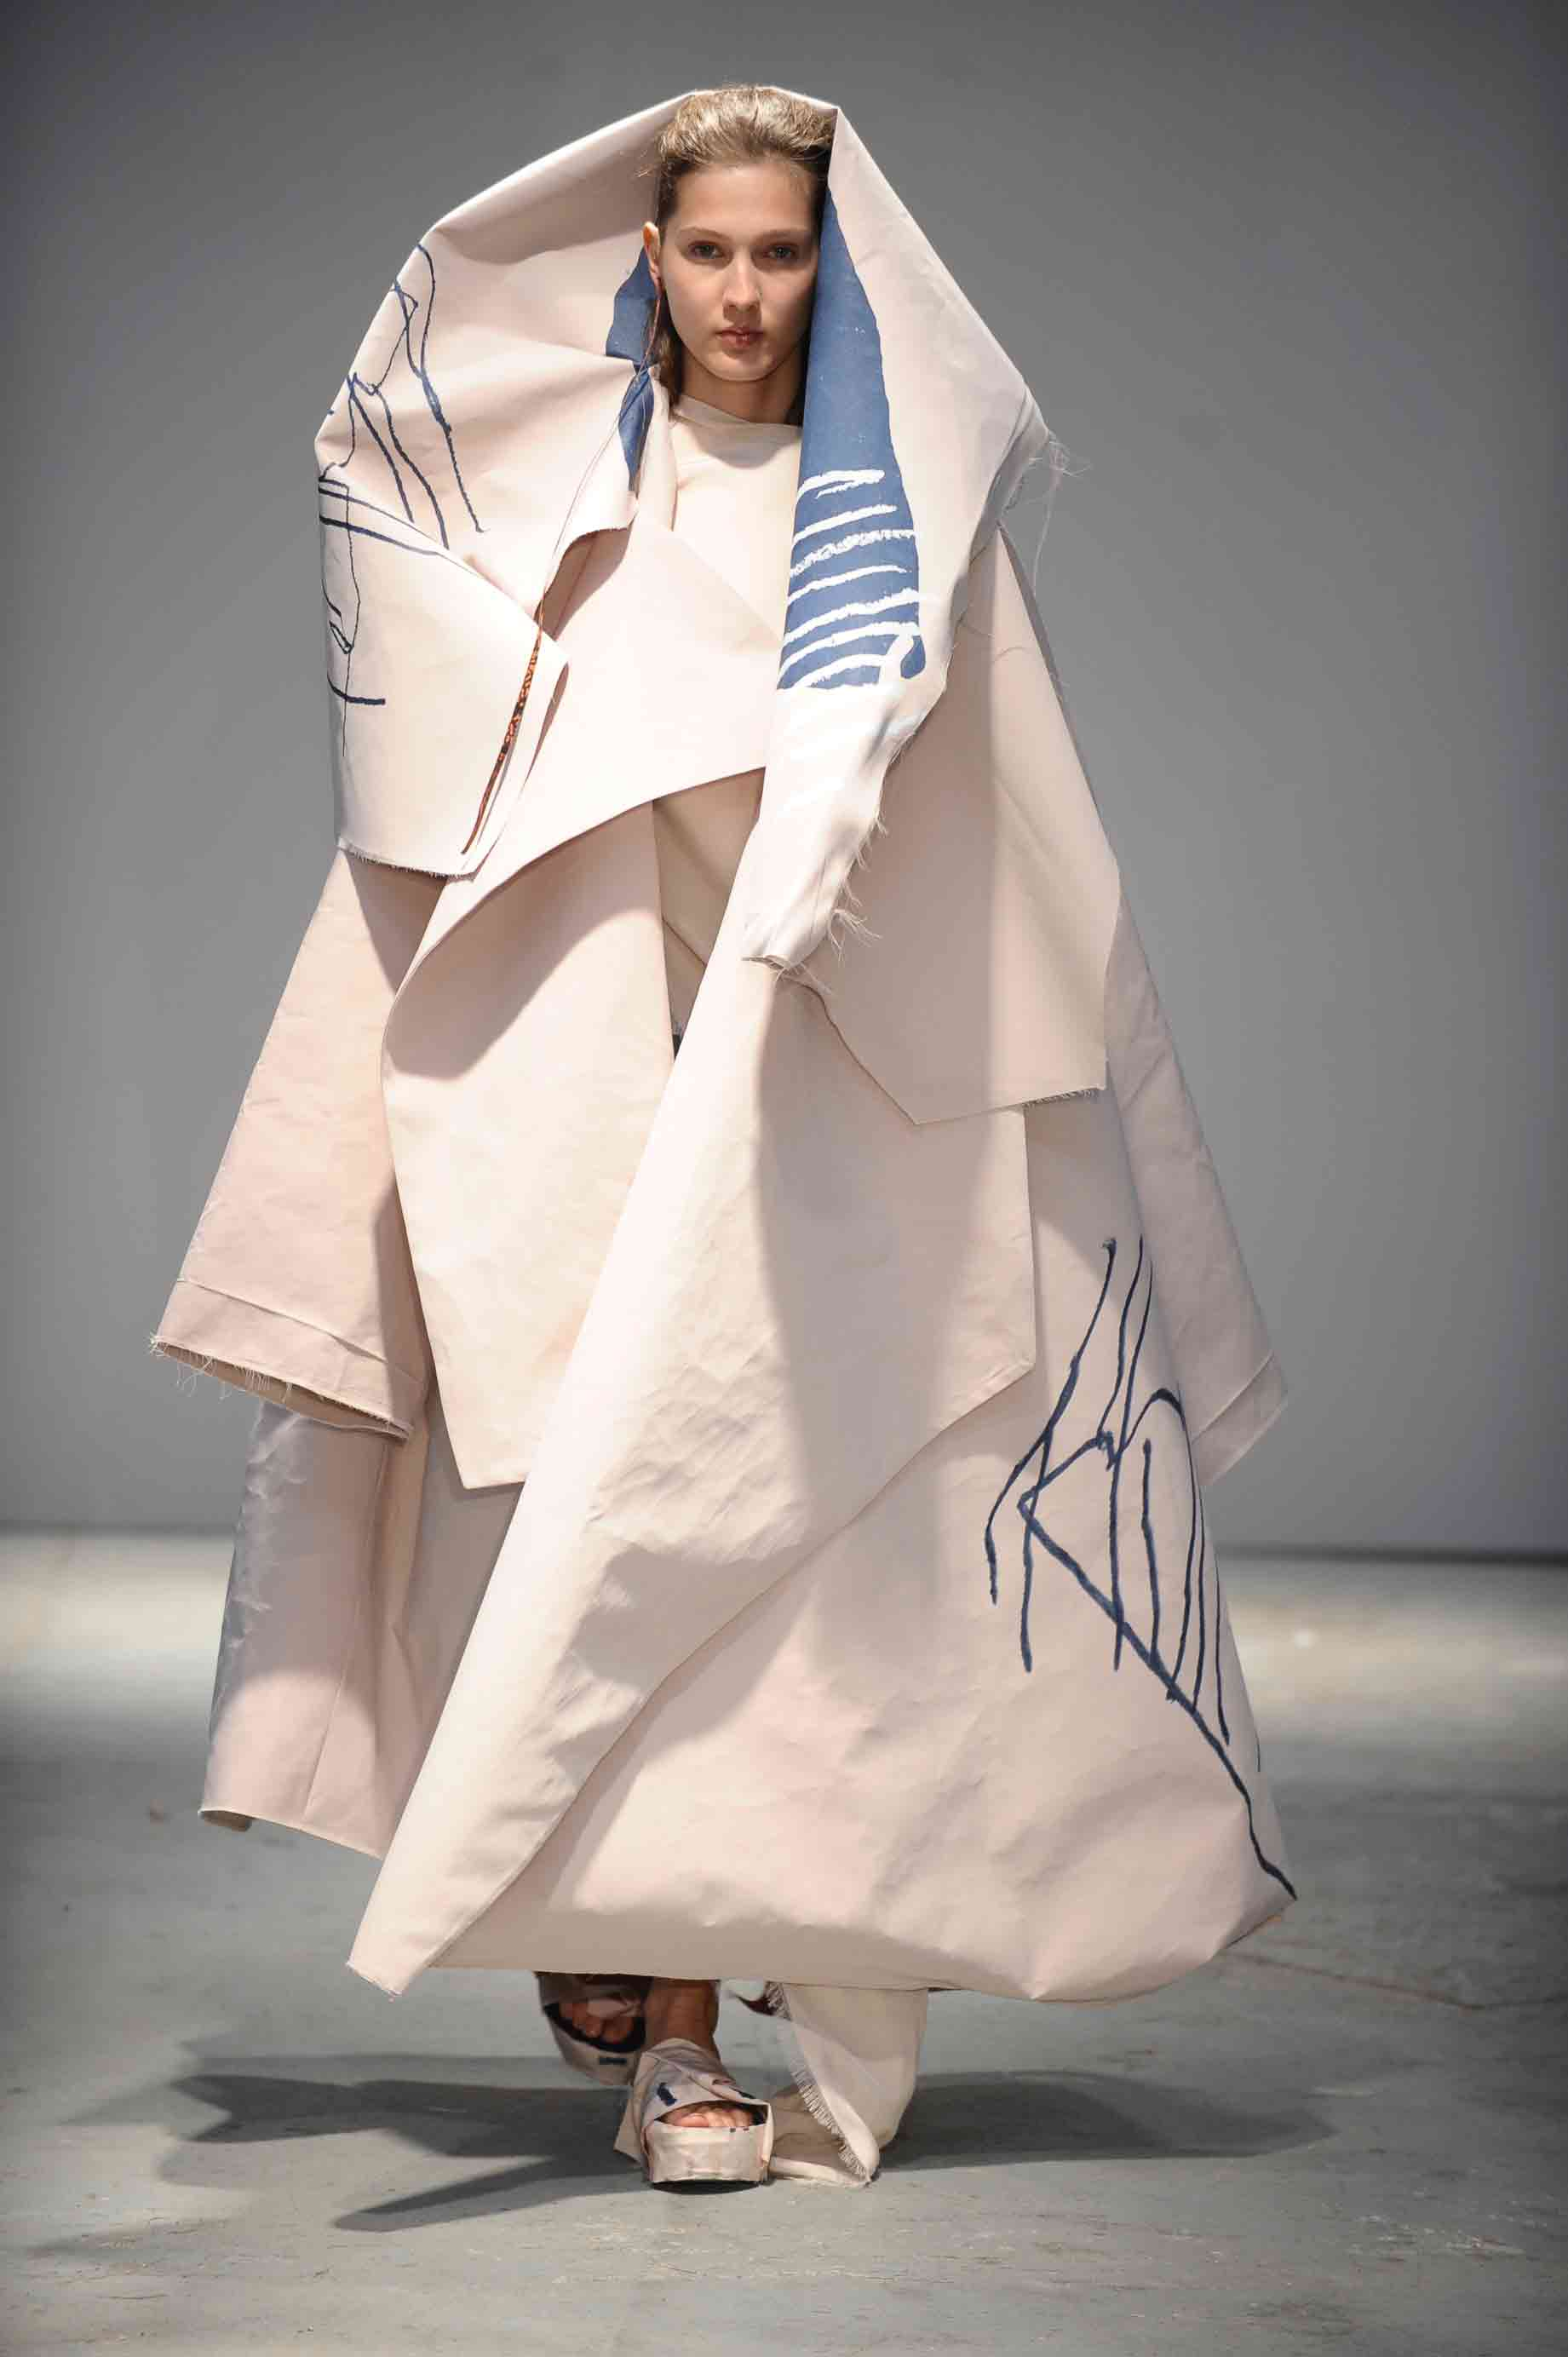 Design by Jaewon Sophie Kim.